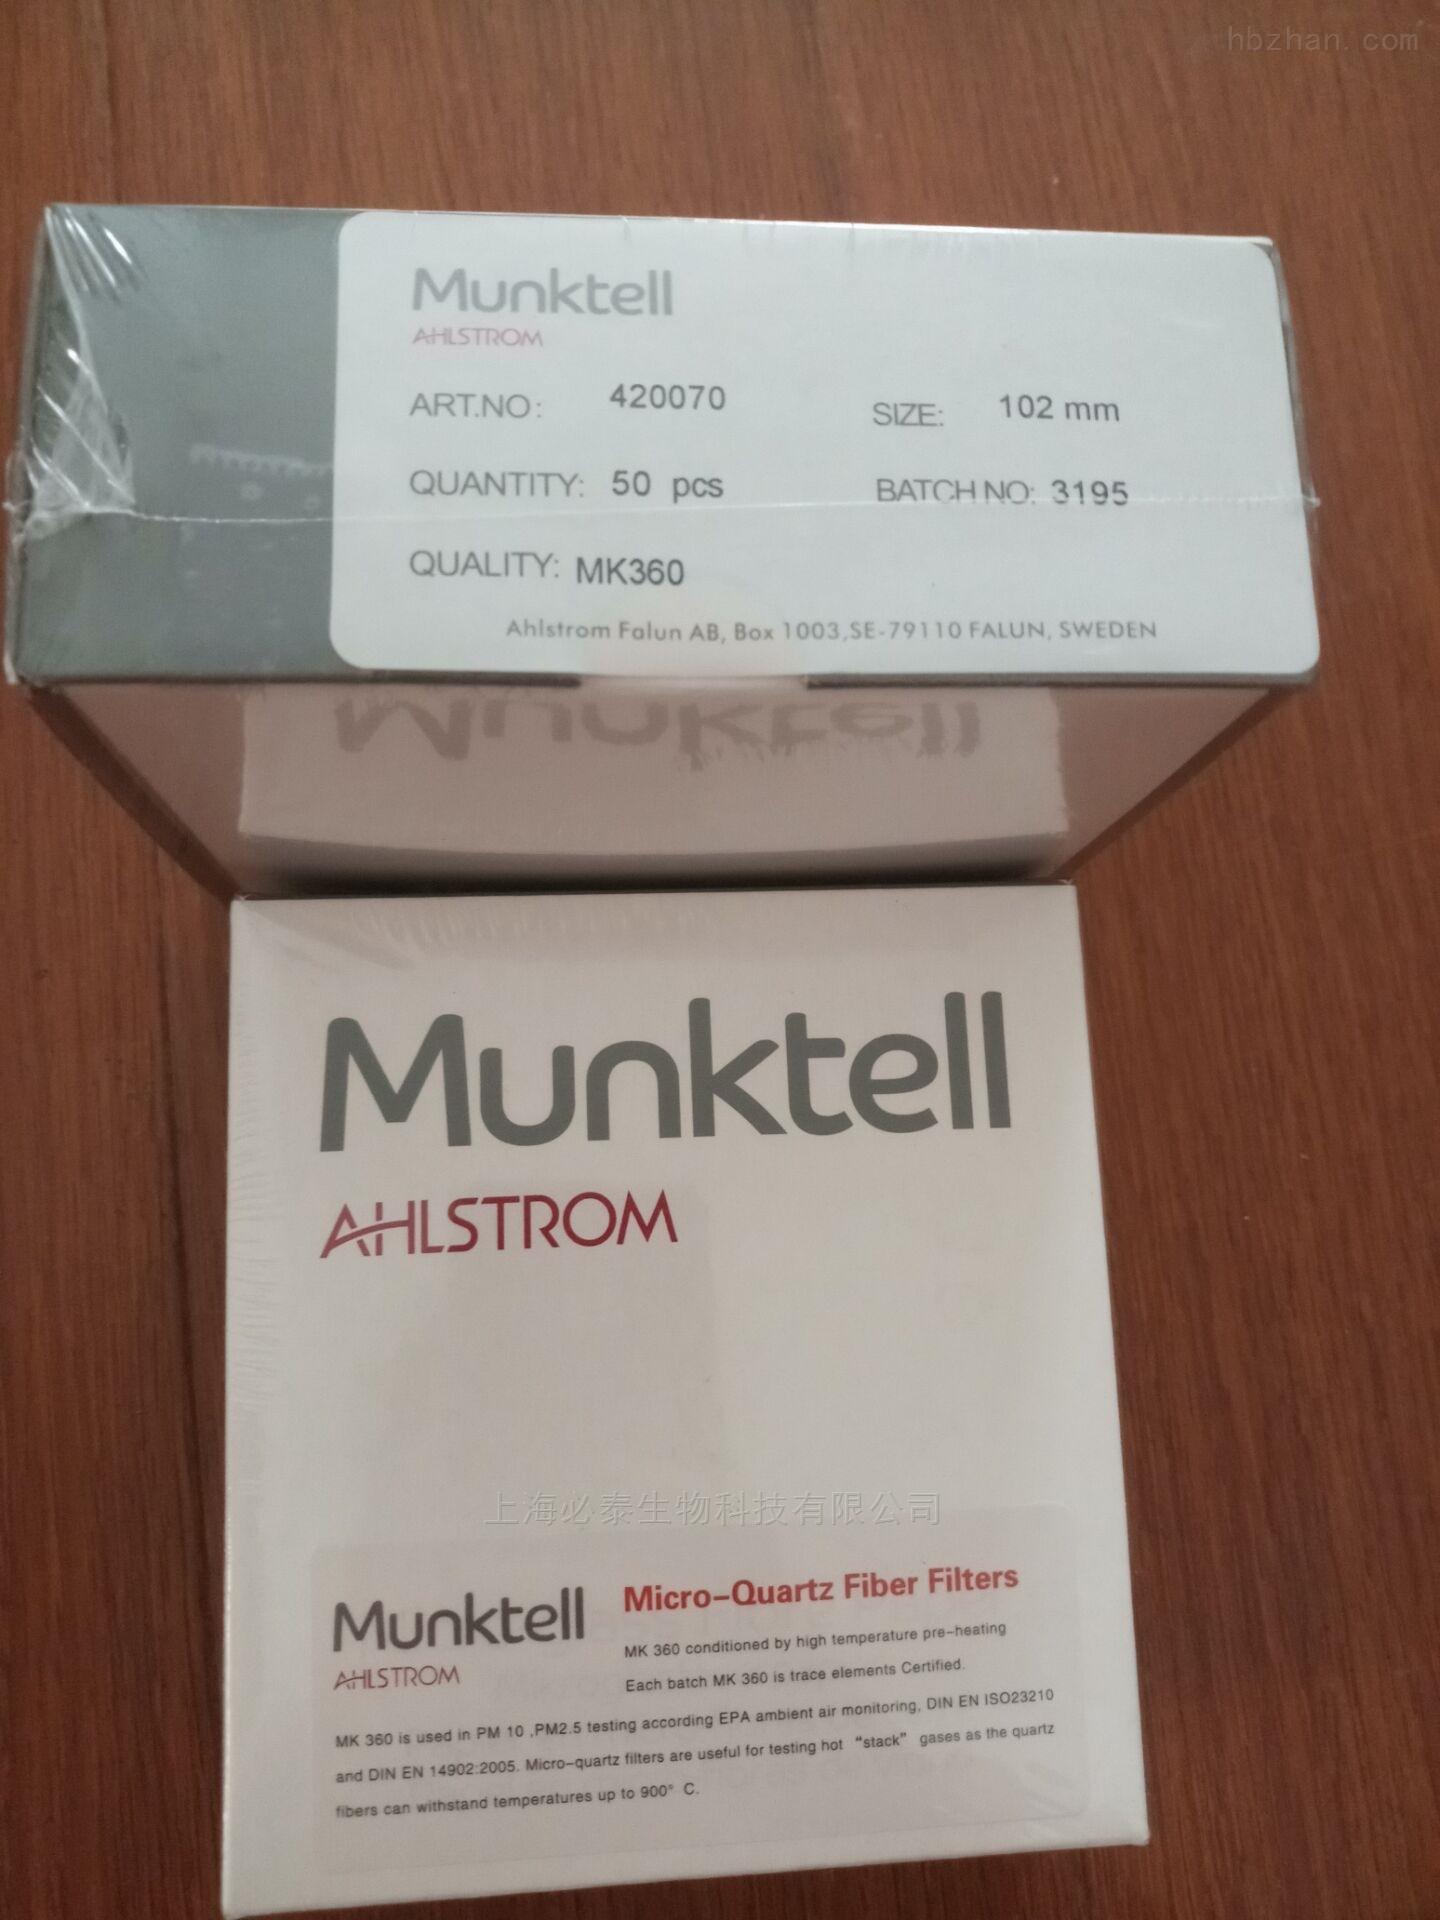 瑞典Munktell 102mm石英滤膜